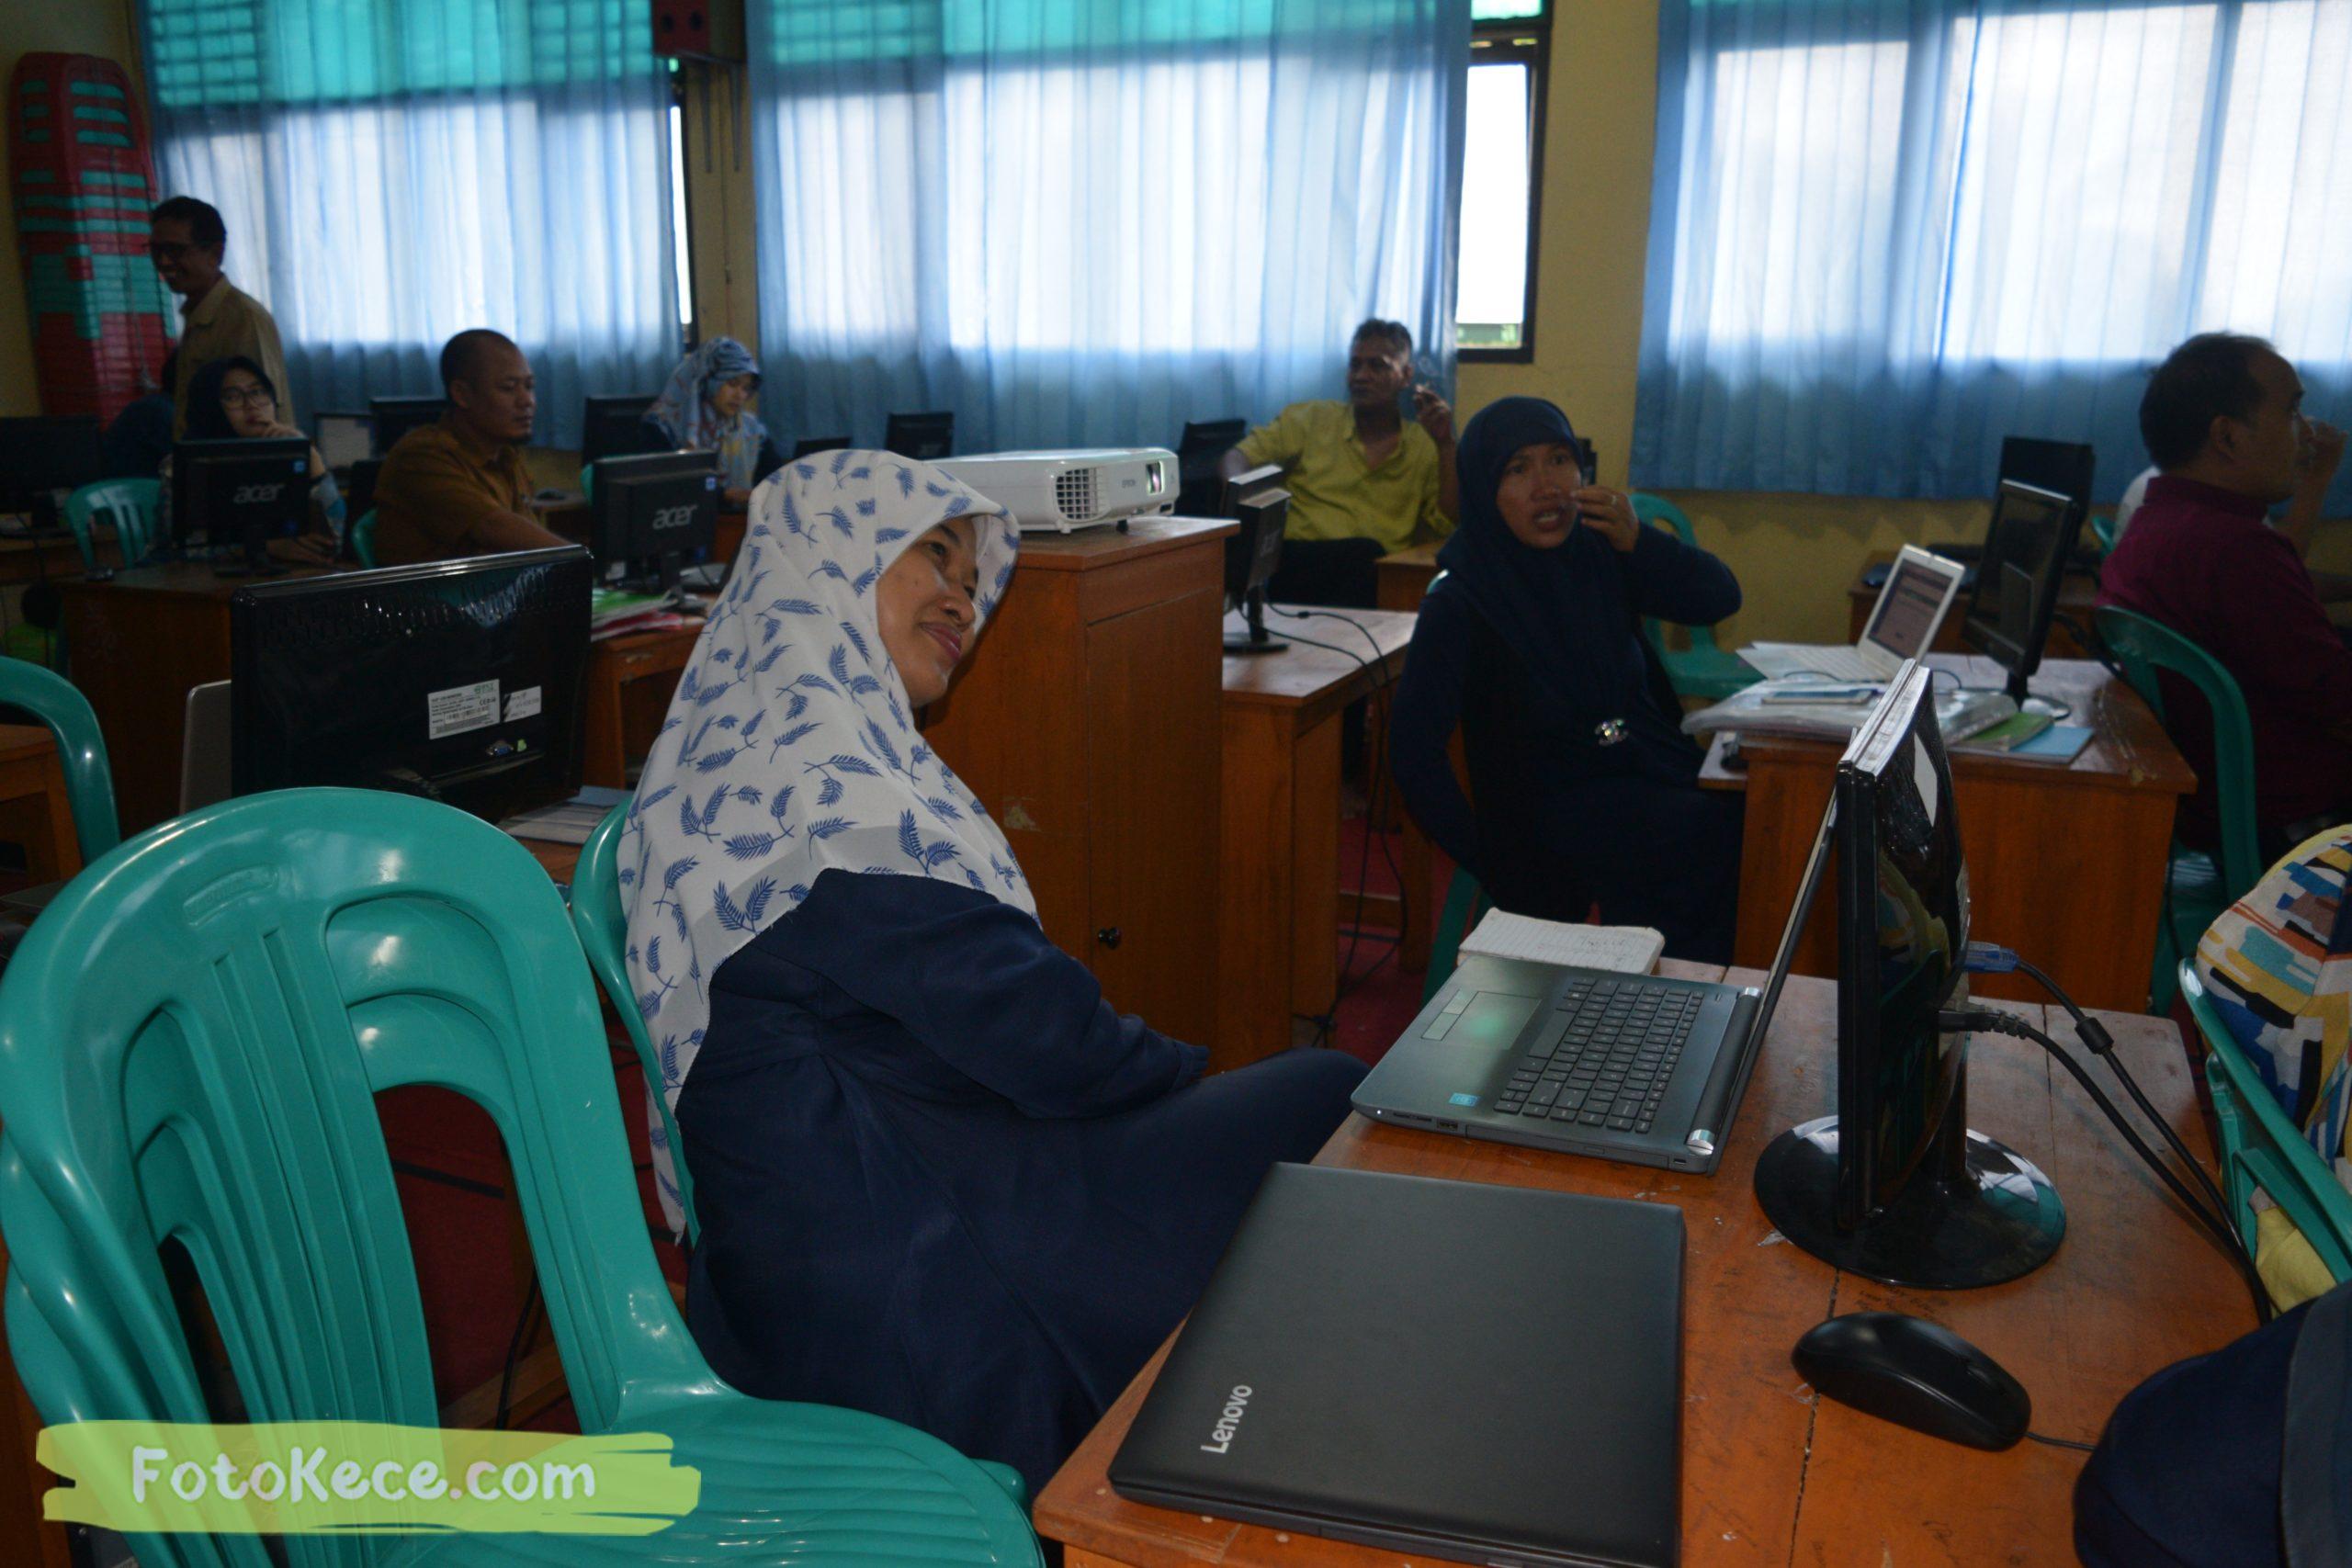 bimbingan teknis sieka 2020 bersama Bpk Abdul Aziz 08012020 fotokece 14 scaled